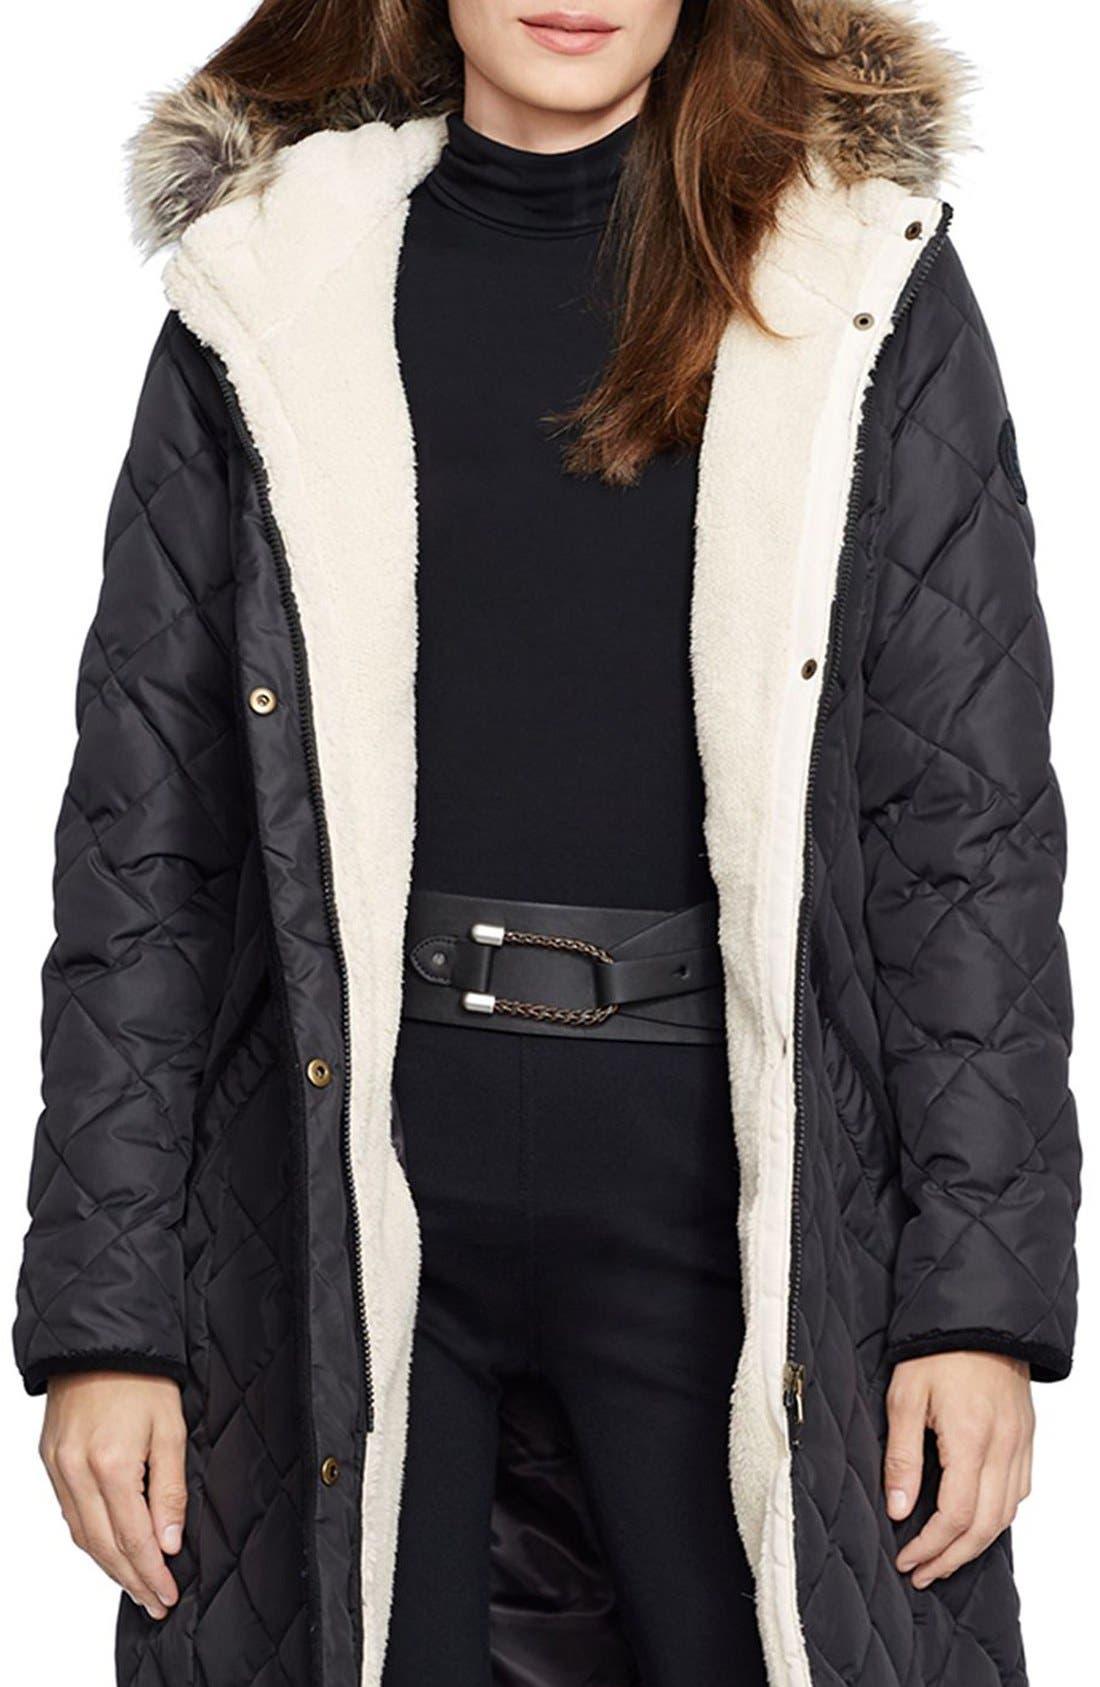 Alternate Image 1 Selected - Lauren Ralph Lauren Faux Fur Trim Down & Feather FillParka (Regular & Petite)